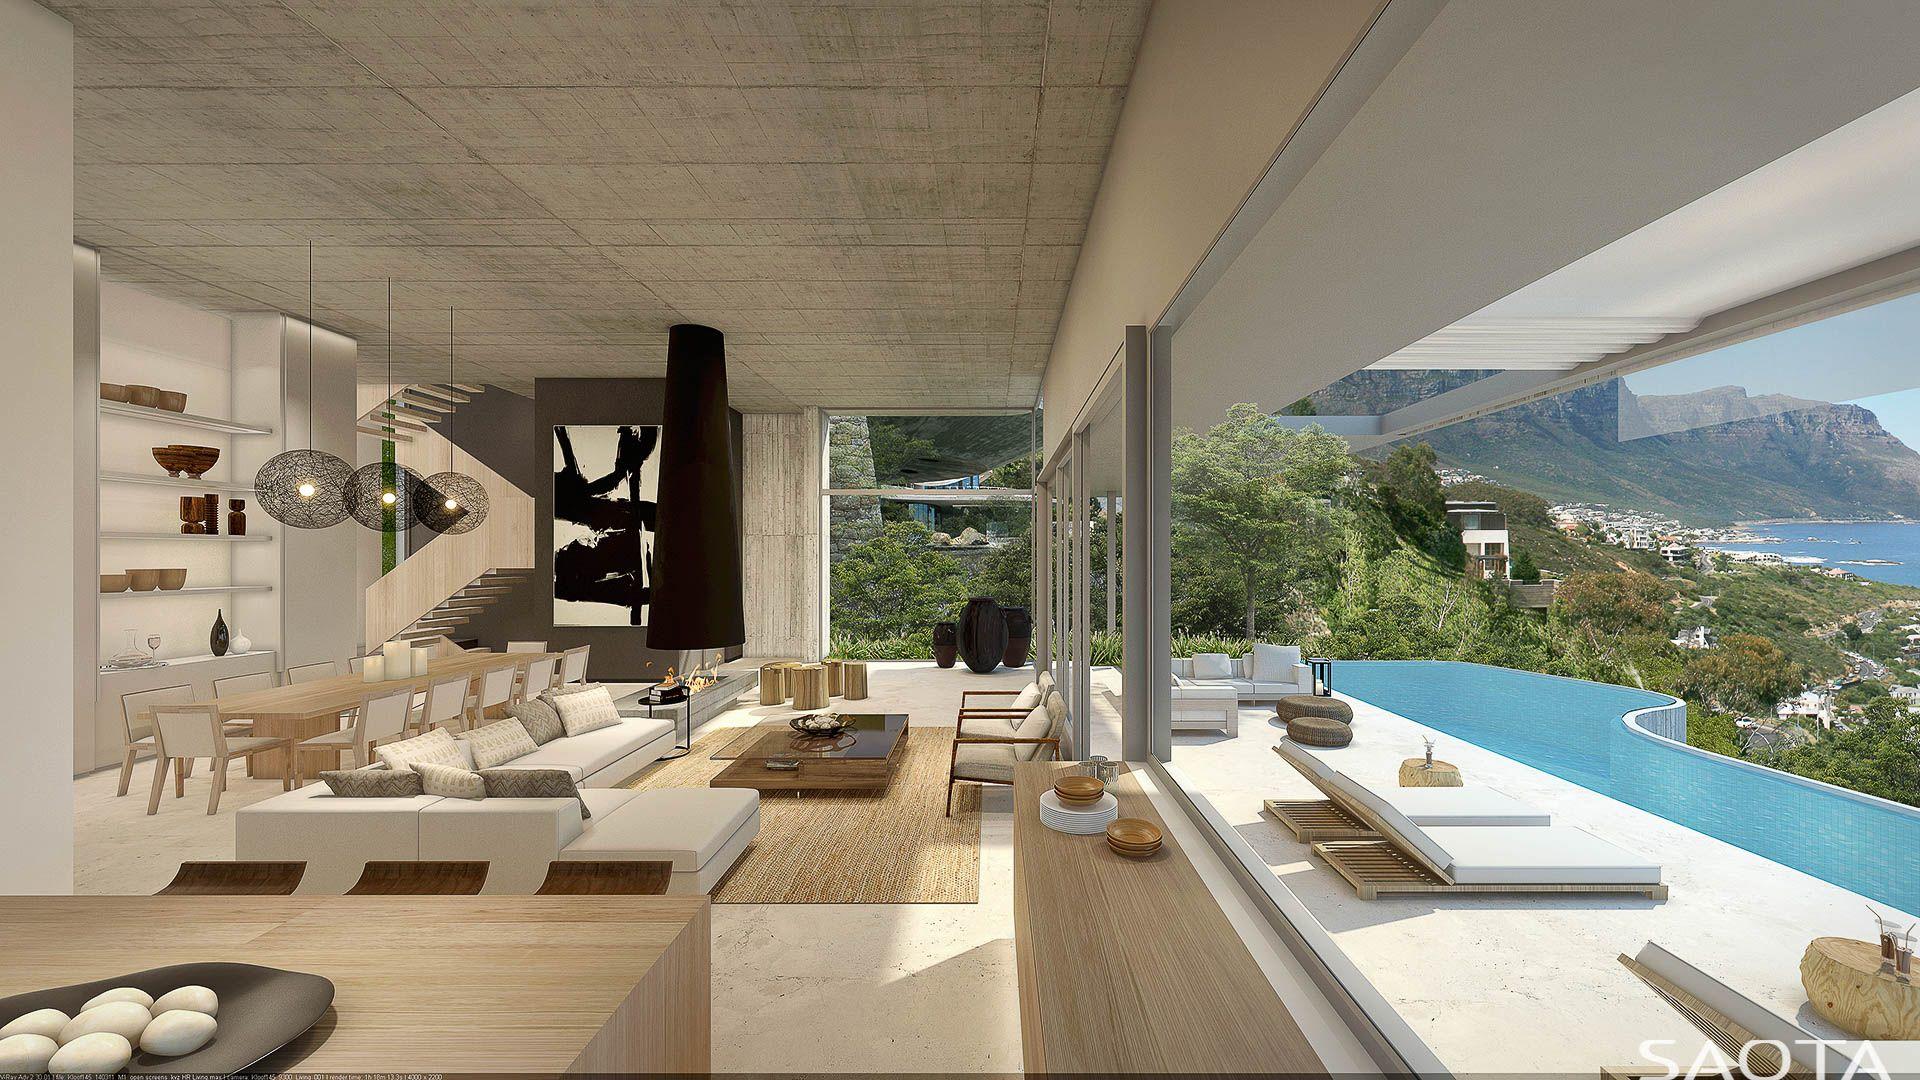 101 Great Room Design Ideas Photos Modern Living Room Inspiration Living Room Design Modern Modern Villa Design #nice #modern #living #room